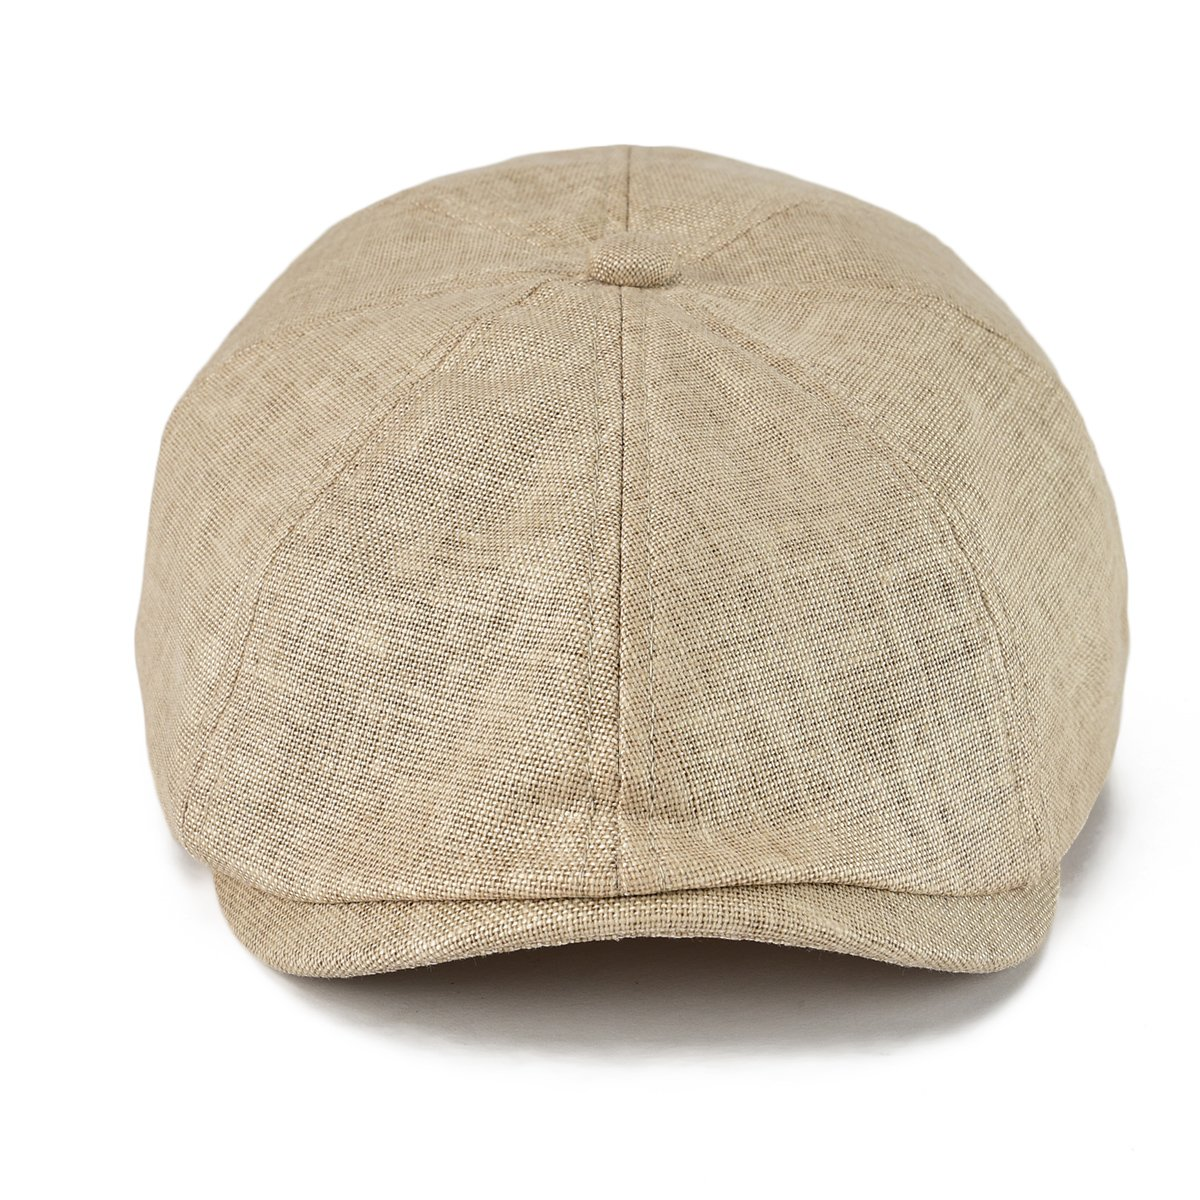 f995f1eb0d4f4 VOBOOM Men Newsboy Caps Breathable Linen Summer hat Ivy Cap Cabbie Flat Cap  MZ106 (Beige) at Amazon Men s Clothing store